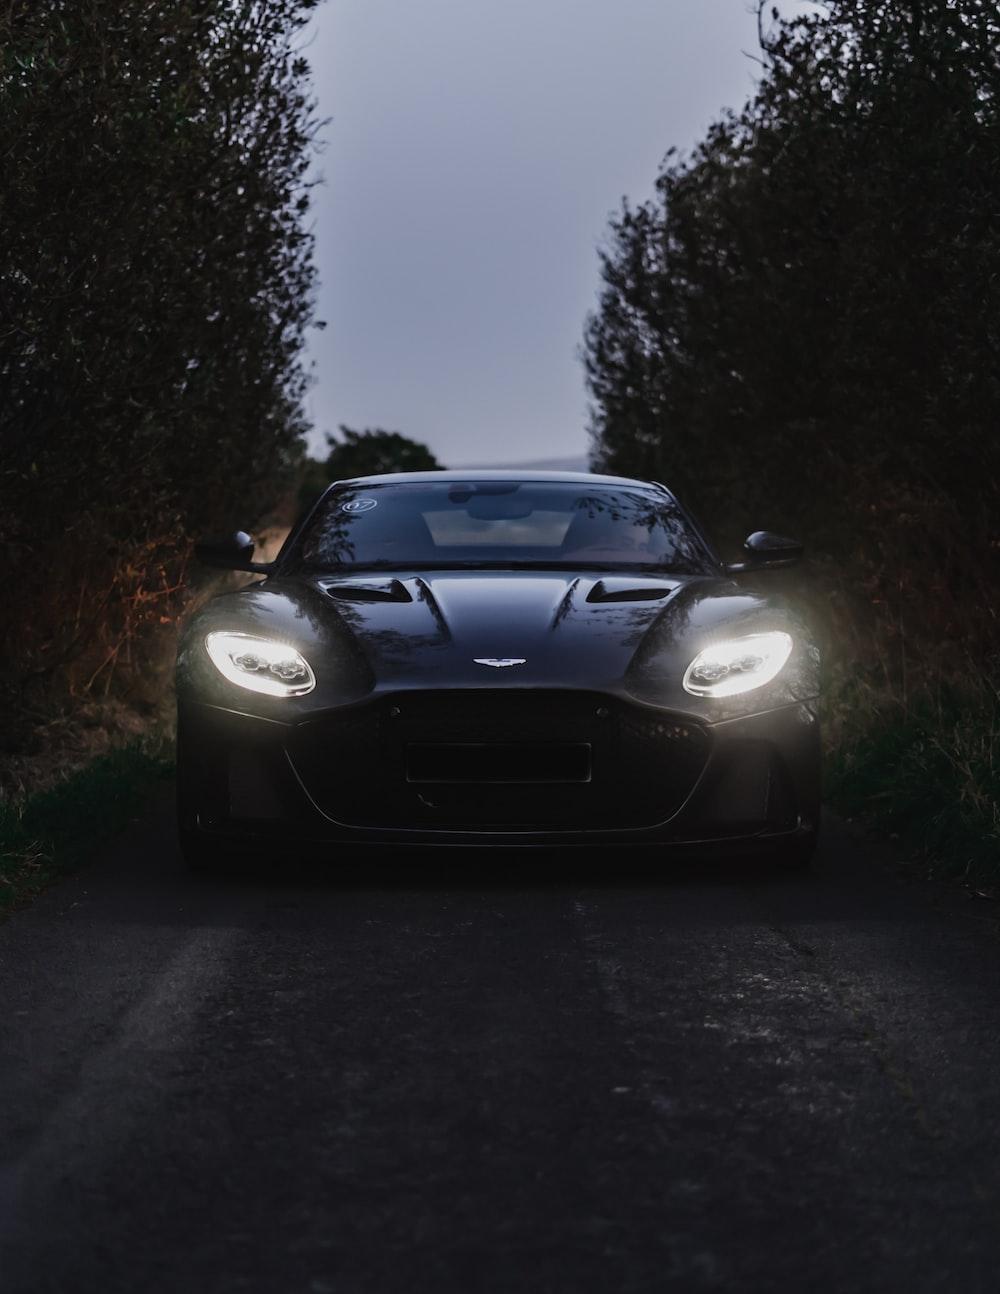 black bmw m 3 on road during night time